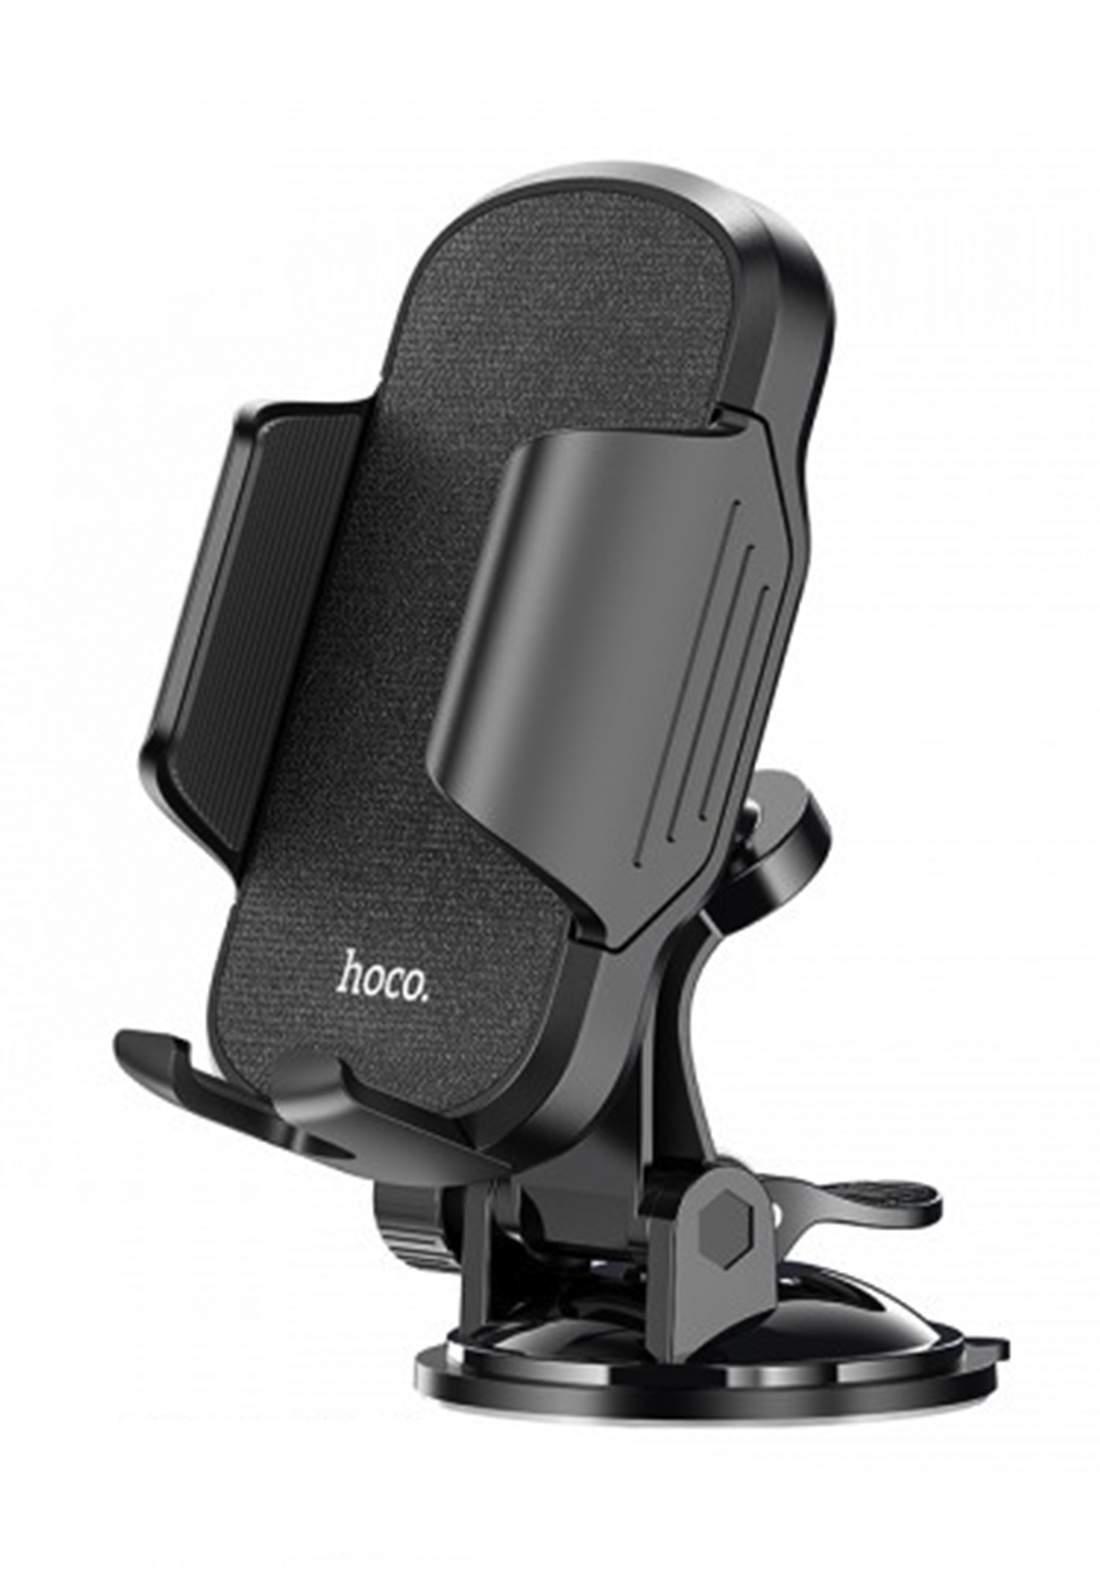 Hococ CA82 Anti-Shake And Stable Car Holder - Black حامل موبايل